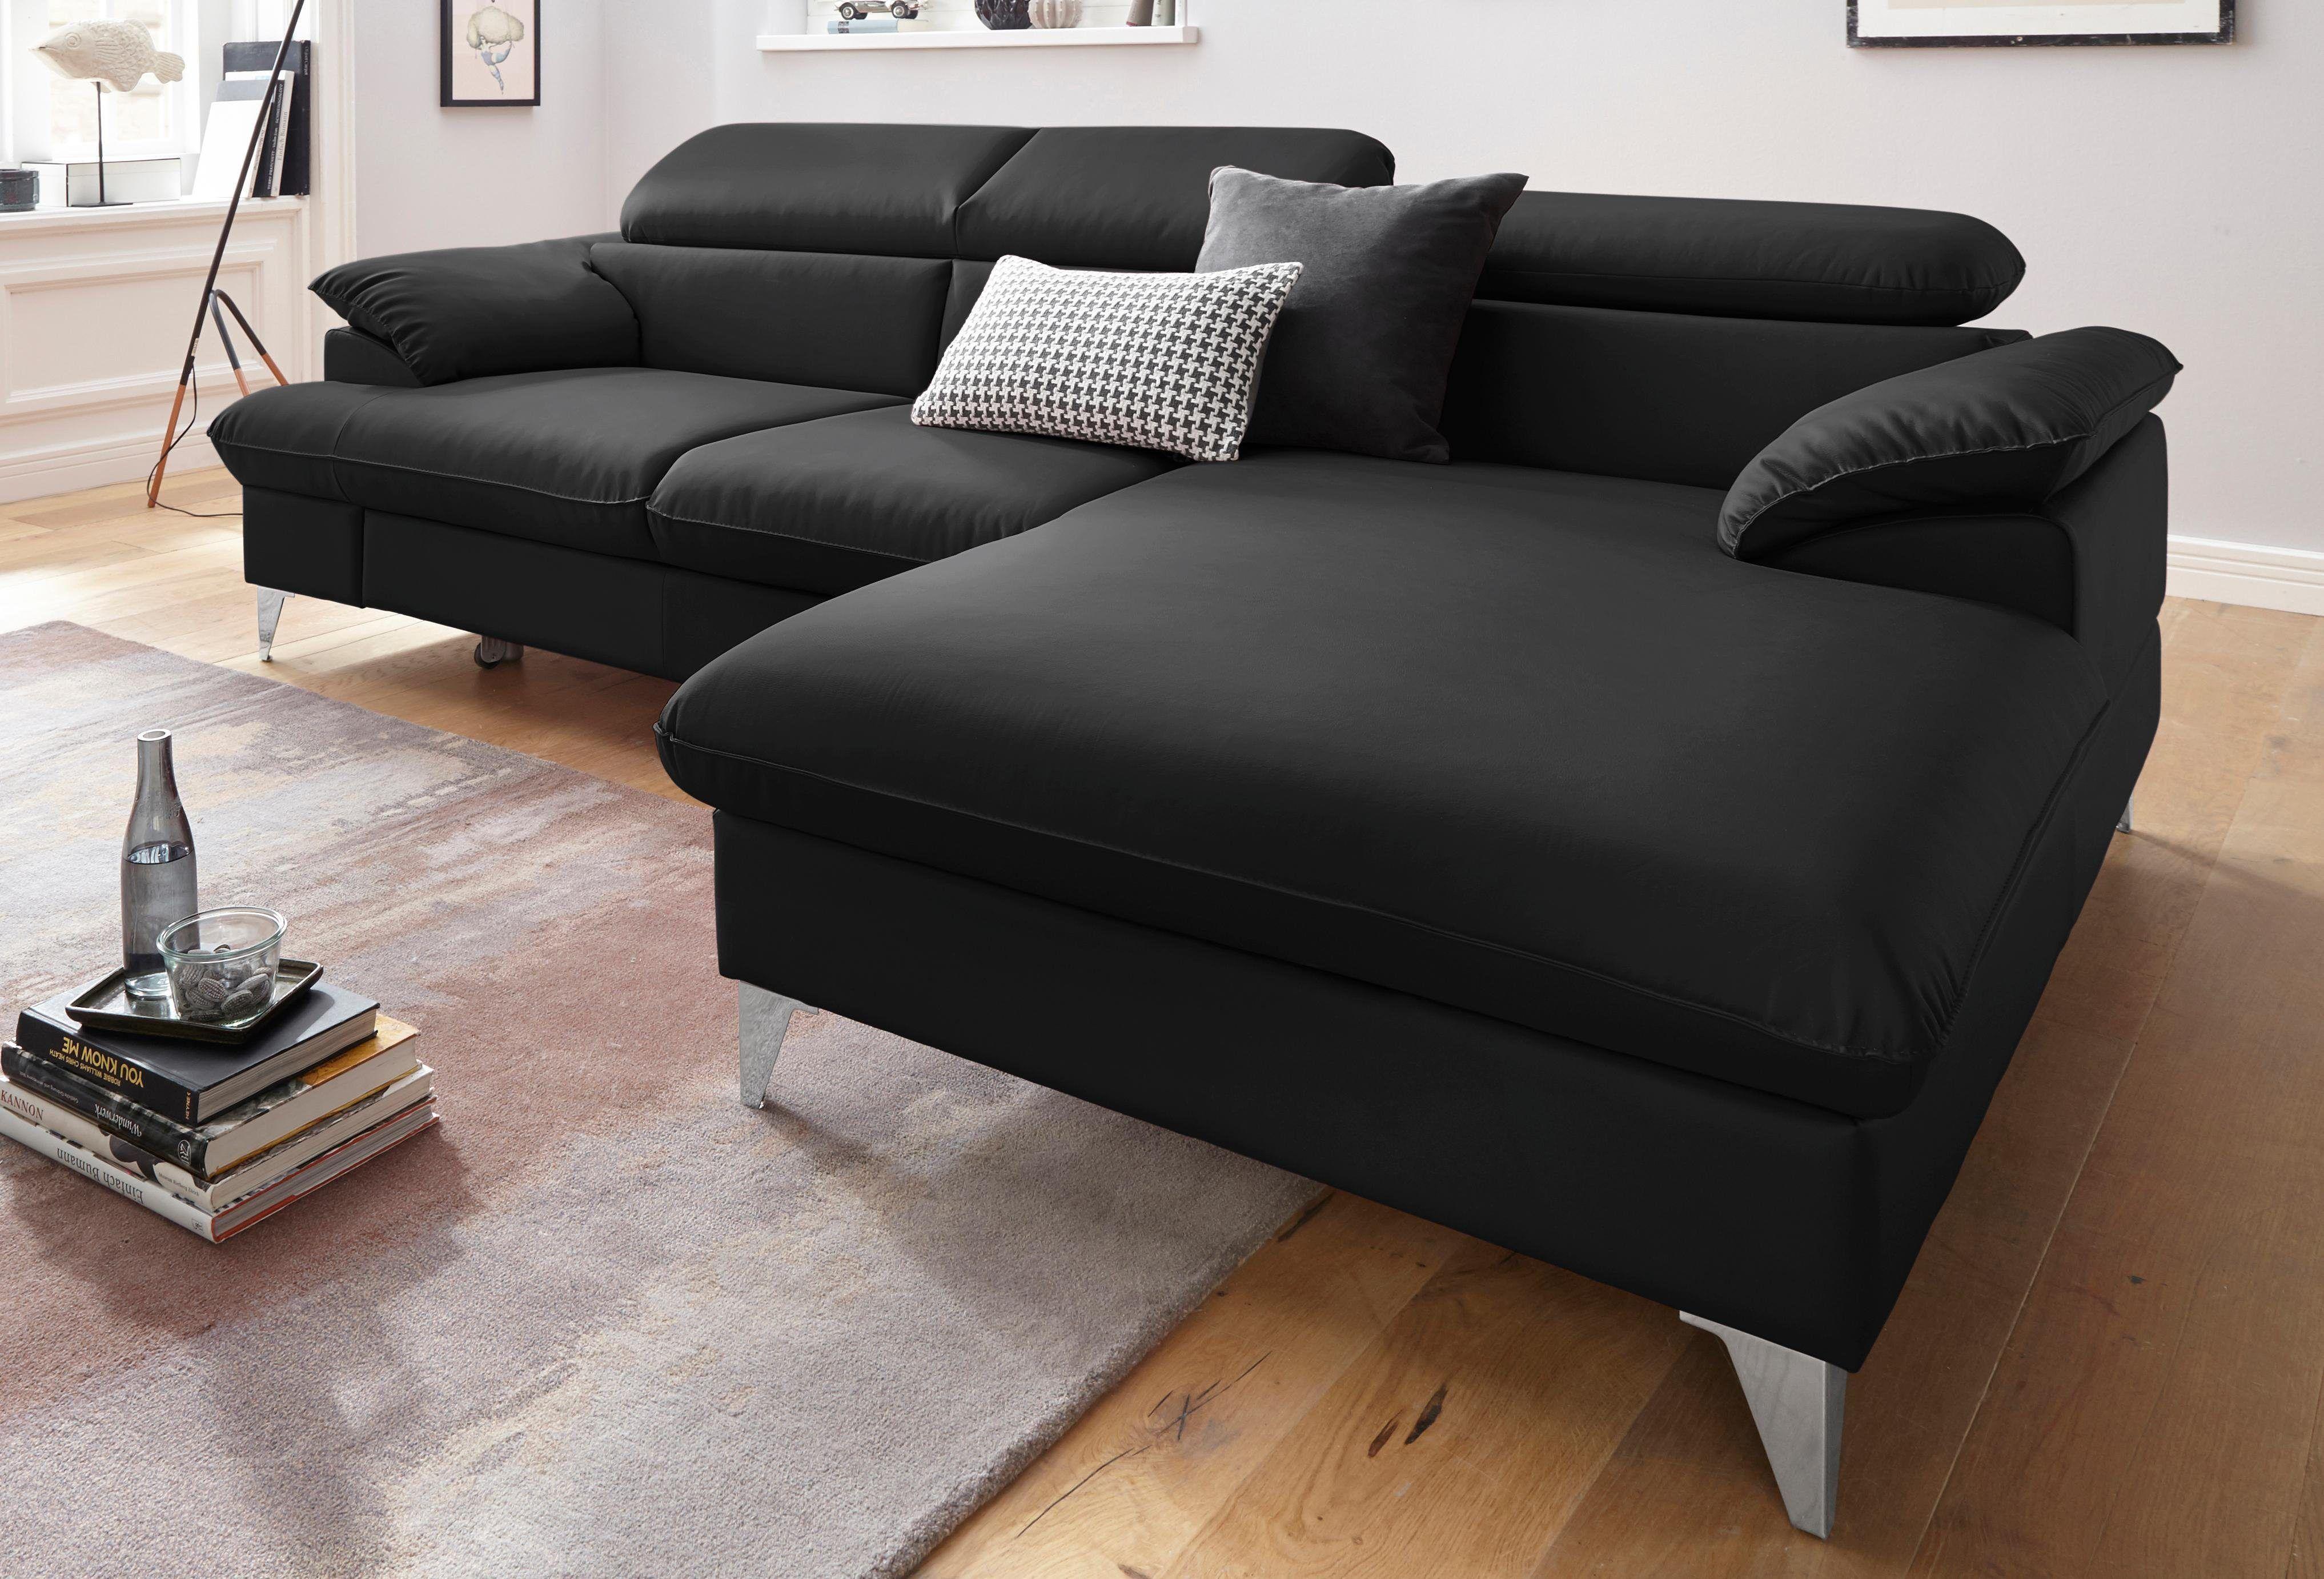 Schwarzes Ledersofa Ledersofa Couch Leder Sofa